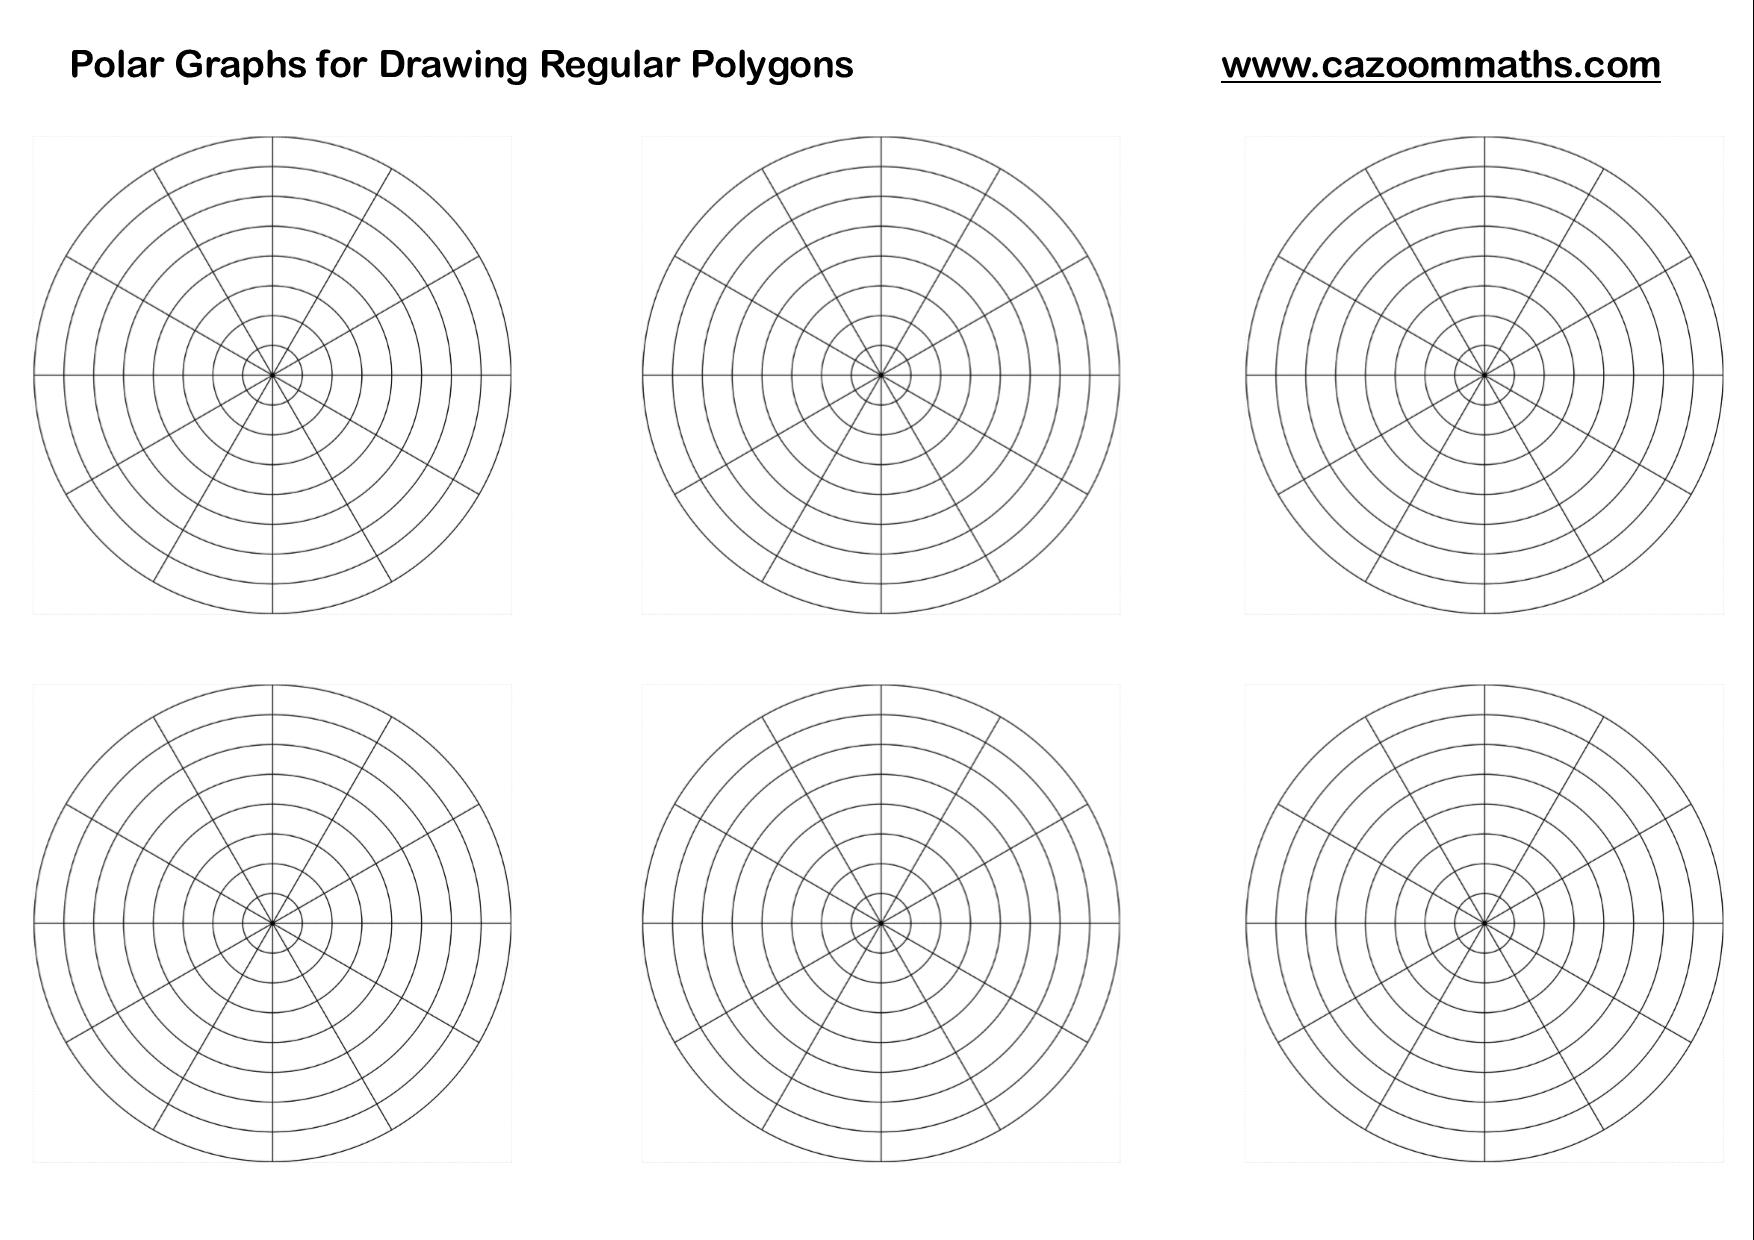 Polar Graphs for Drawing Regular Polygons | Cazoom Maths Worksheets